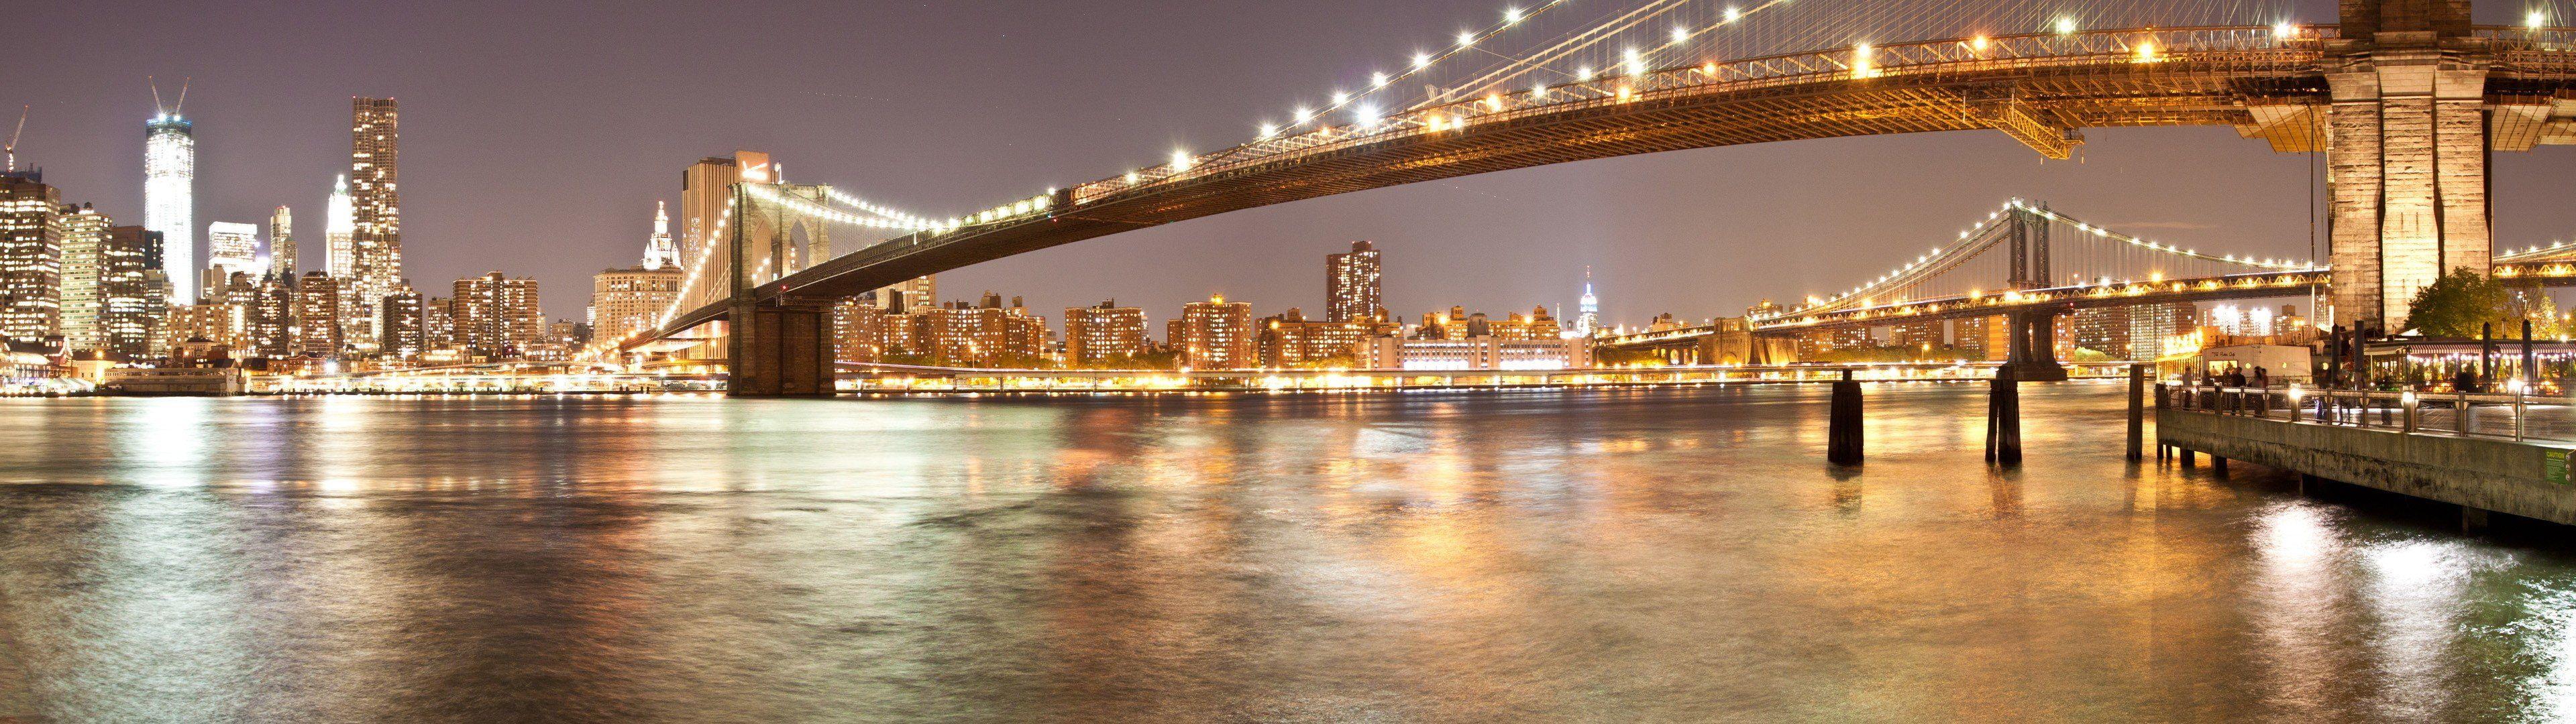 3840x1080 Px Brooklyn Bridge Multiple Display New York City People Actresses Hd Art Brooklyn Bridge New York Ci Brooklyn Bridge New York City People Wallpaper